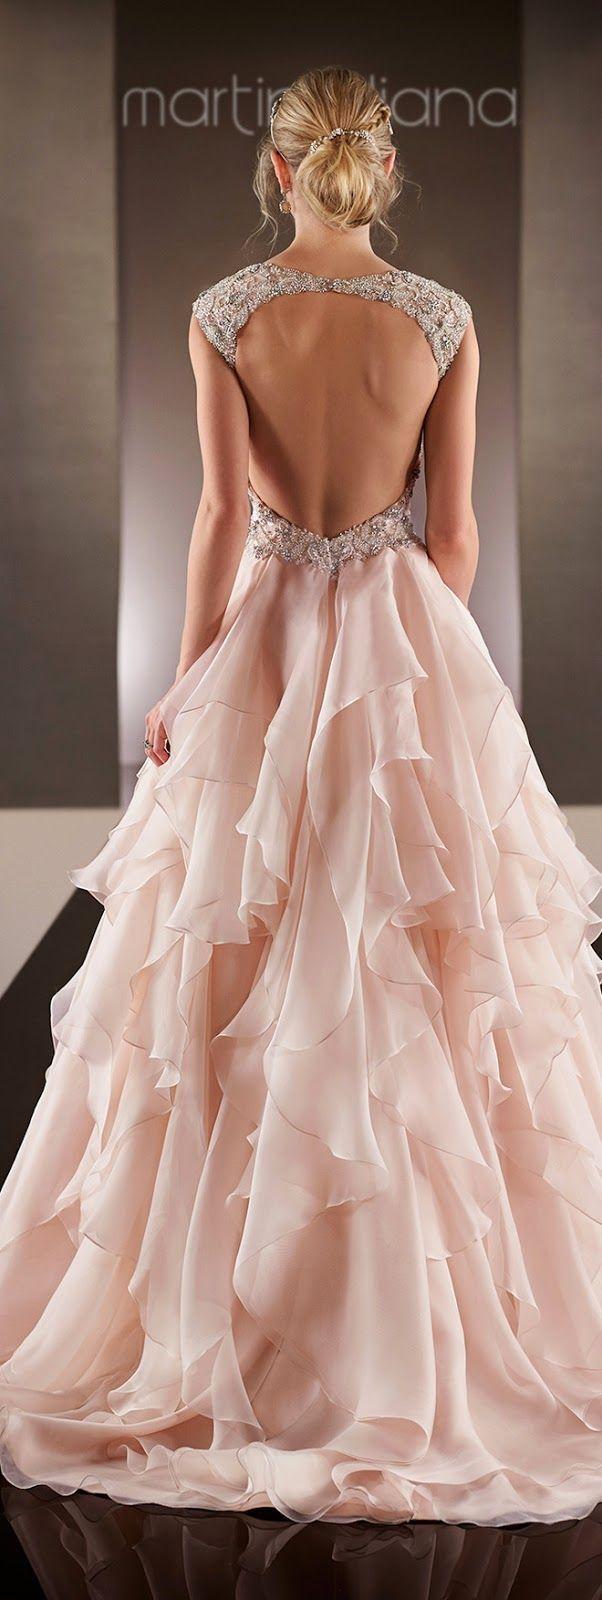 Martina Liana wedding dress | trouwjurk | Pinterest | Los vestidos ...